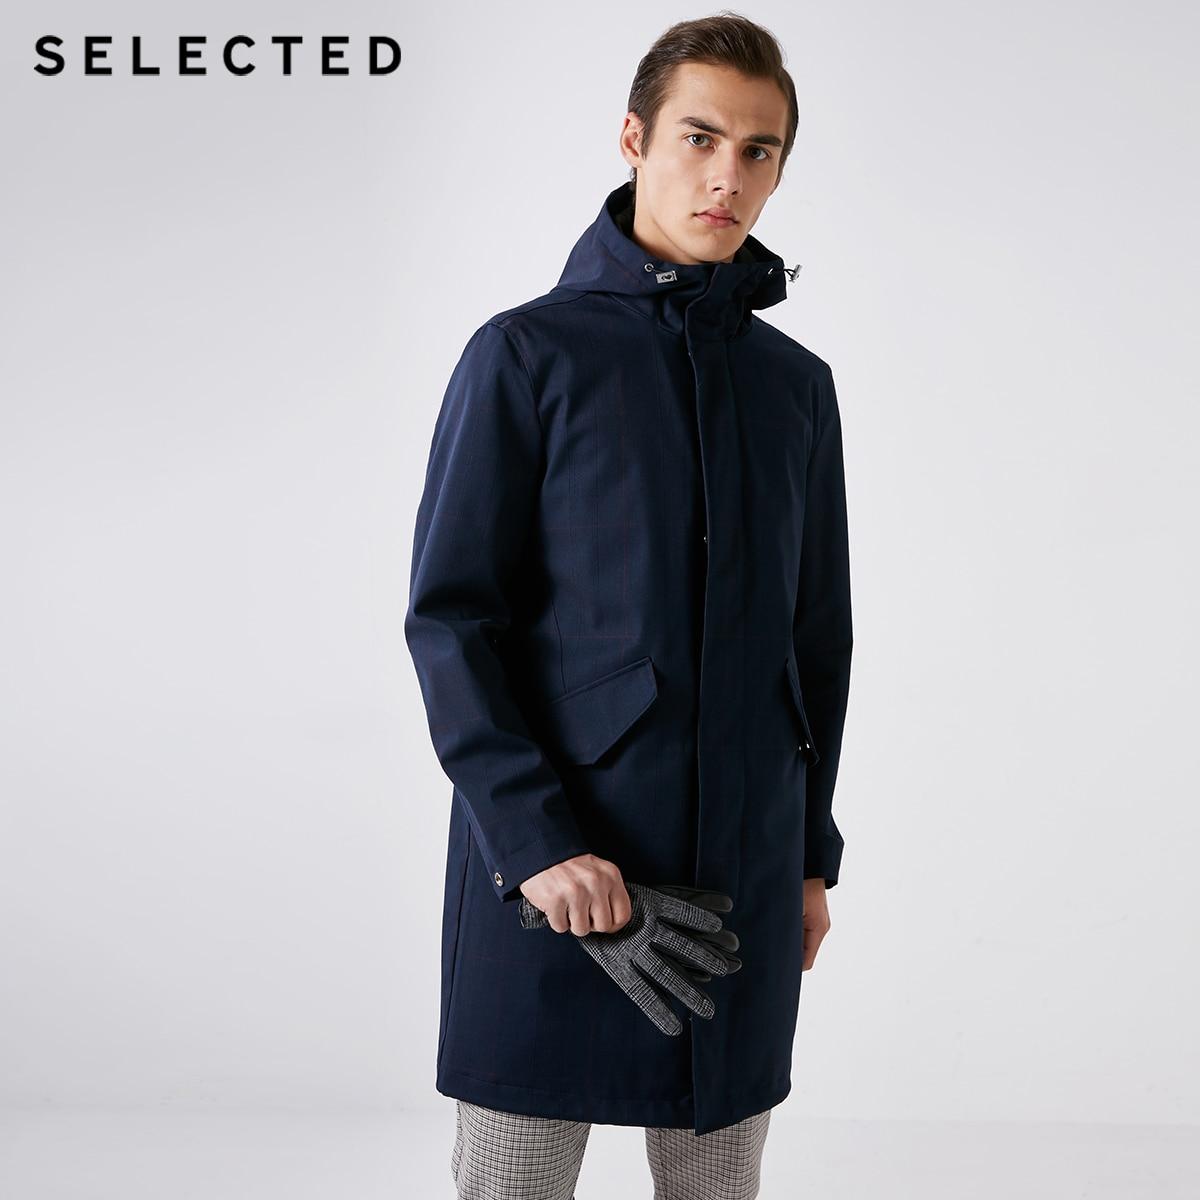 SELECTED Men's Spring Dark Plaid Mid-length Hooded Trench Coat S 4191OM511